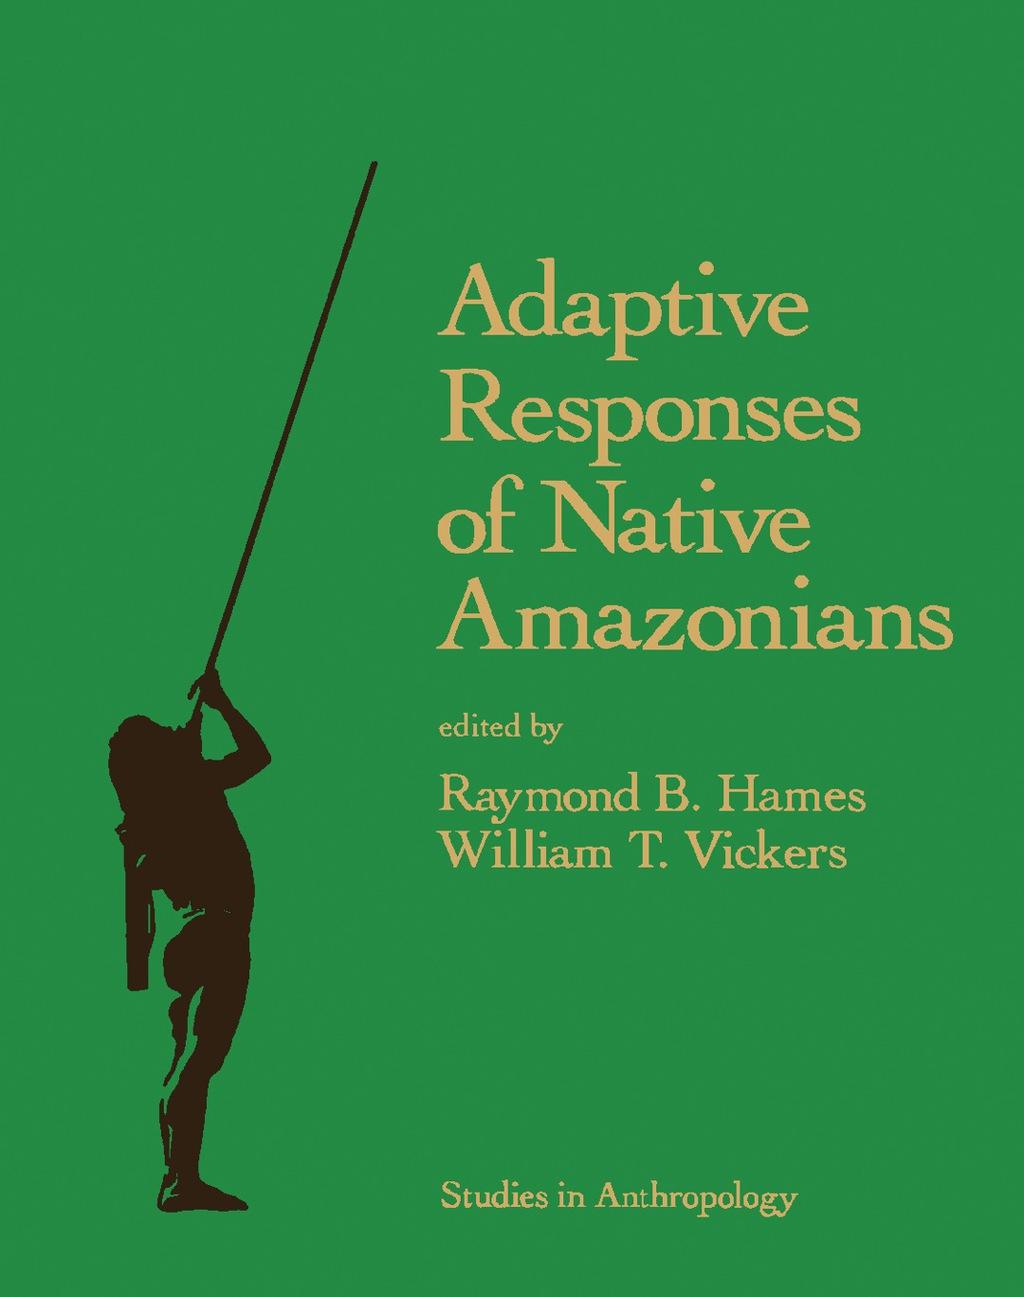 Adaptive Responses of Native Amazonians (eBook)